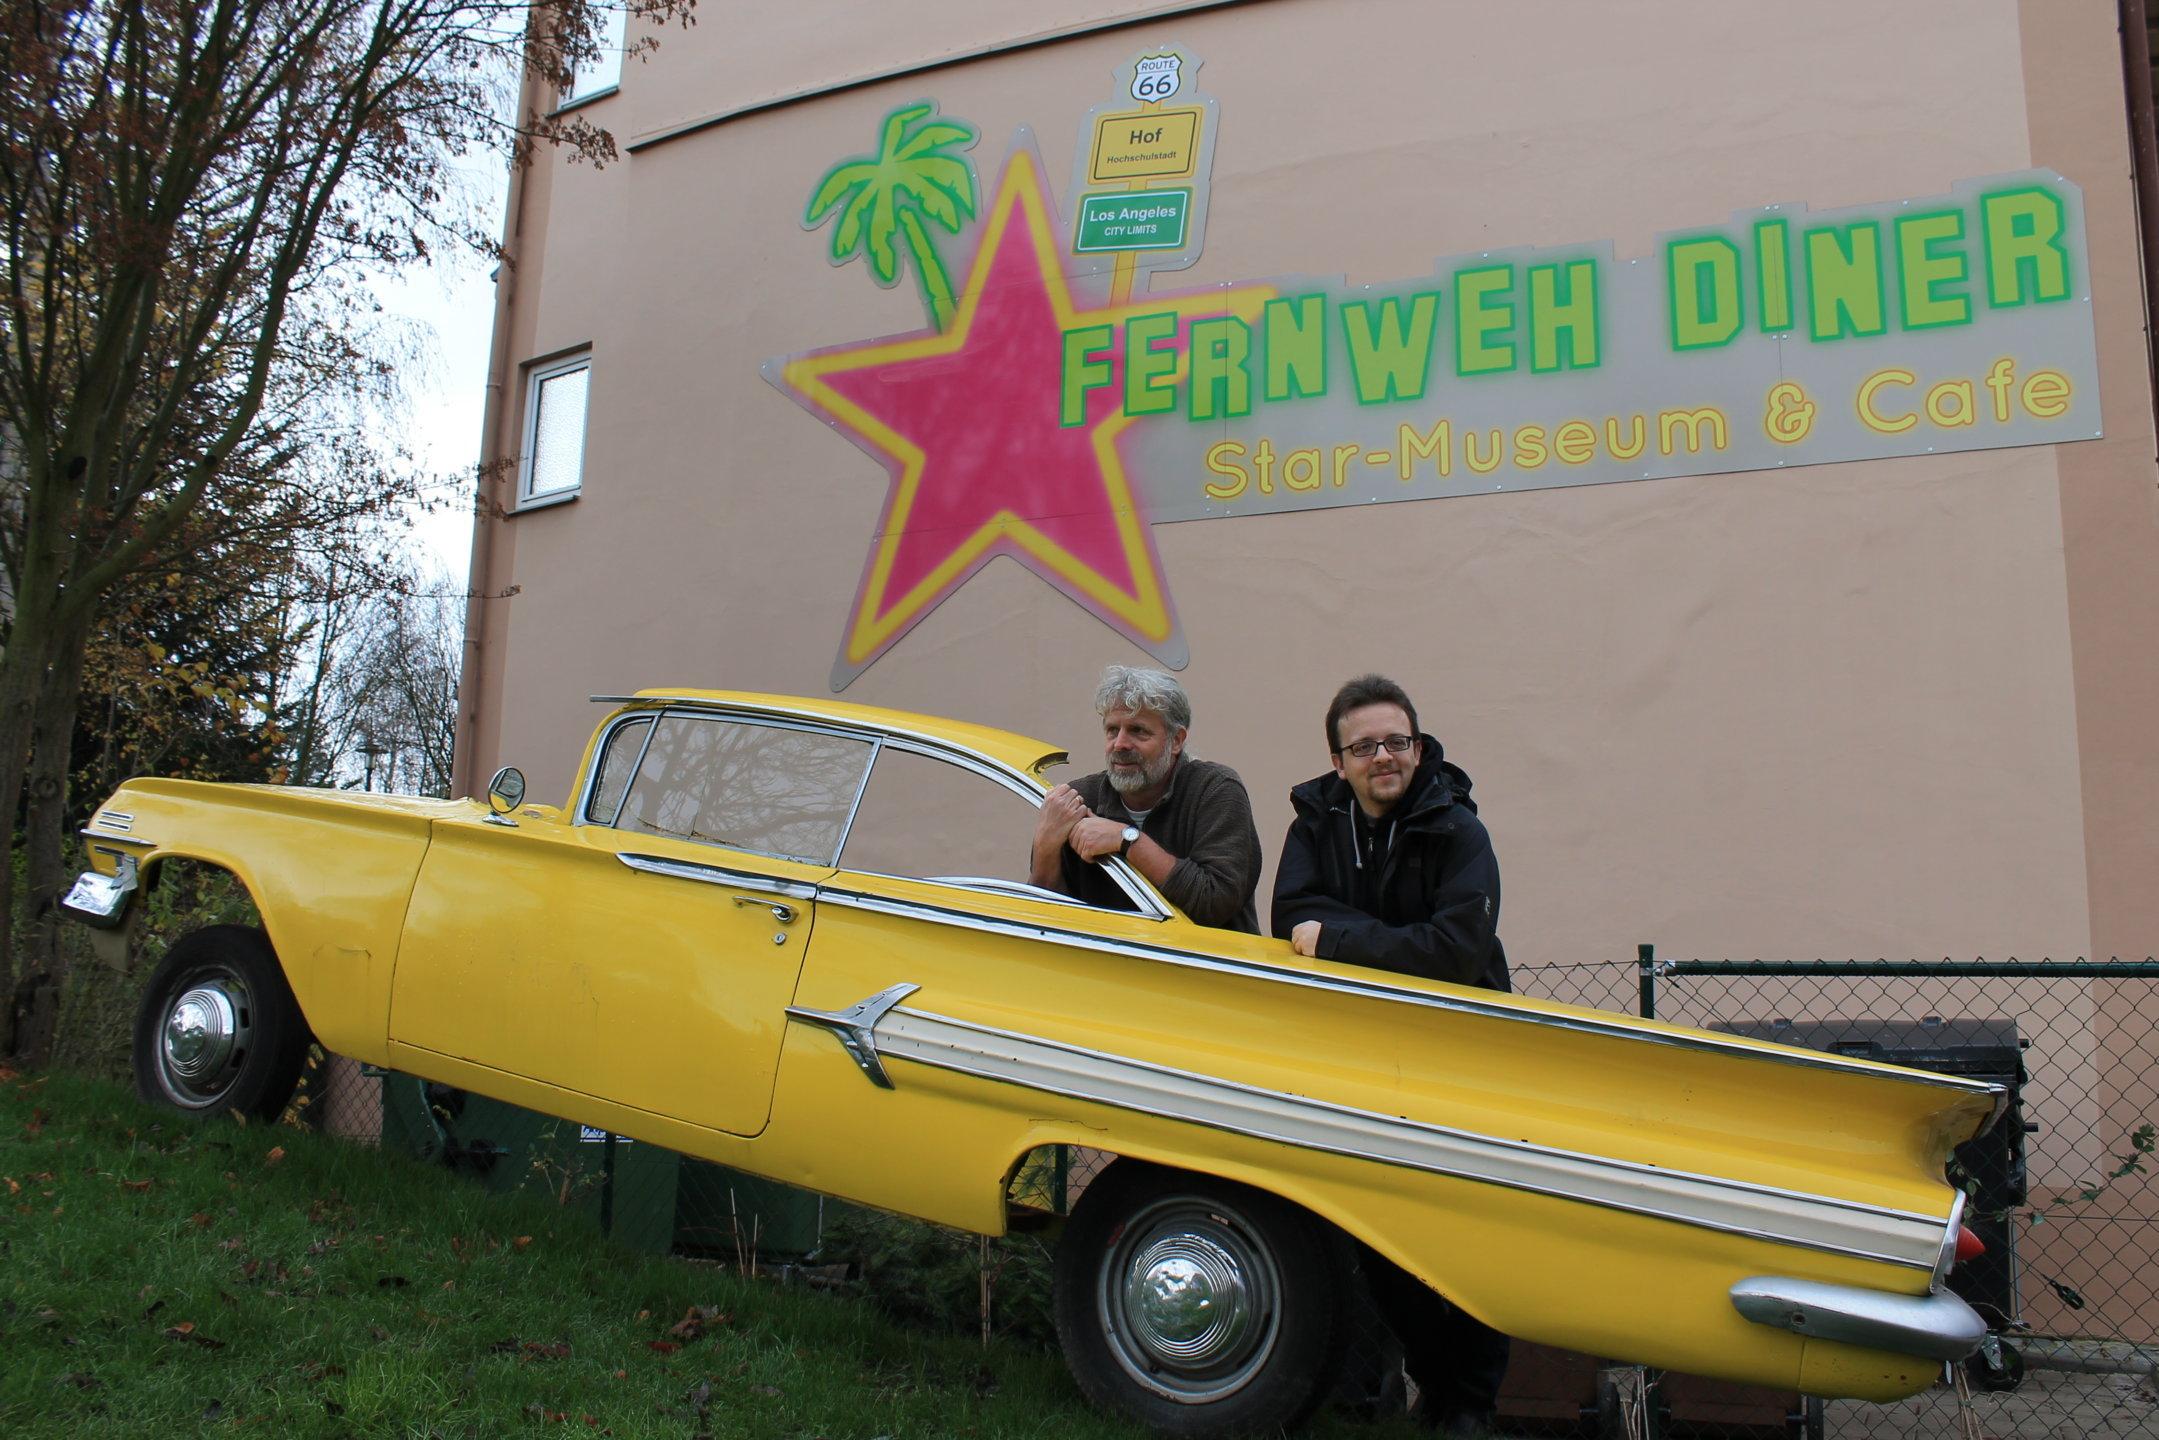 Shiregreen_Klaus & Paul am Fernweh-Diner